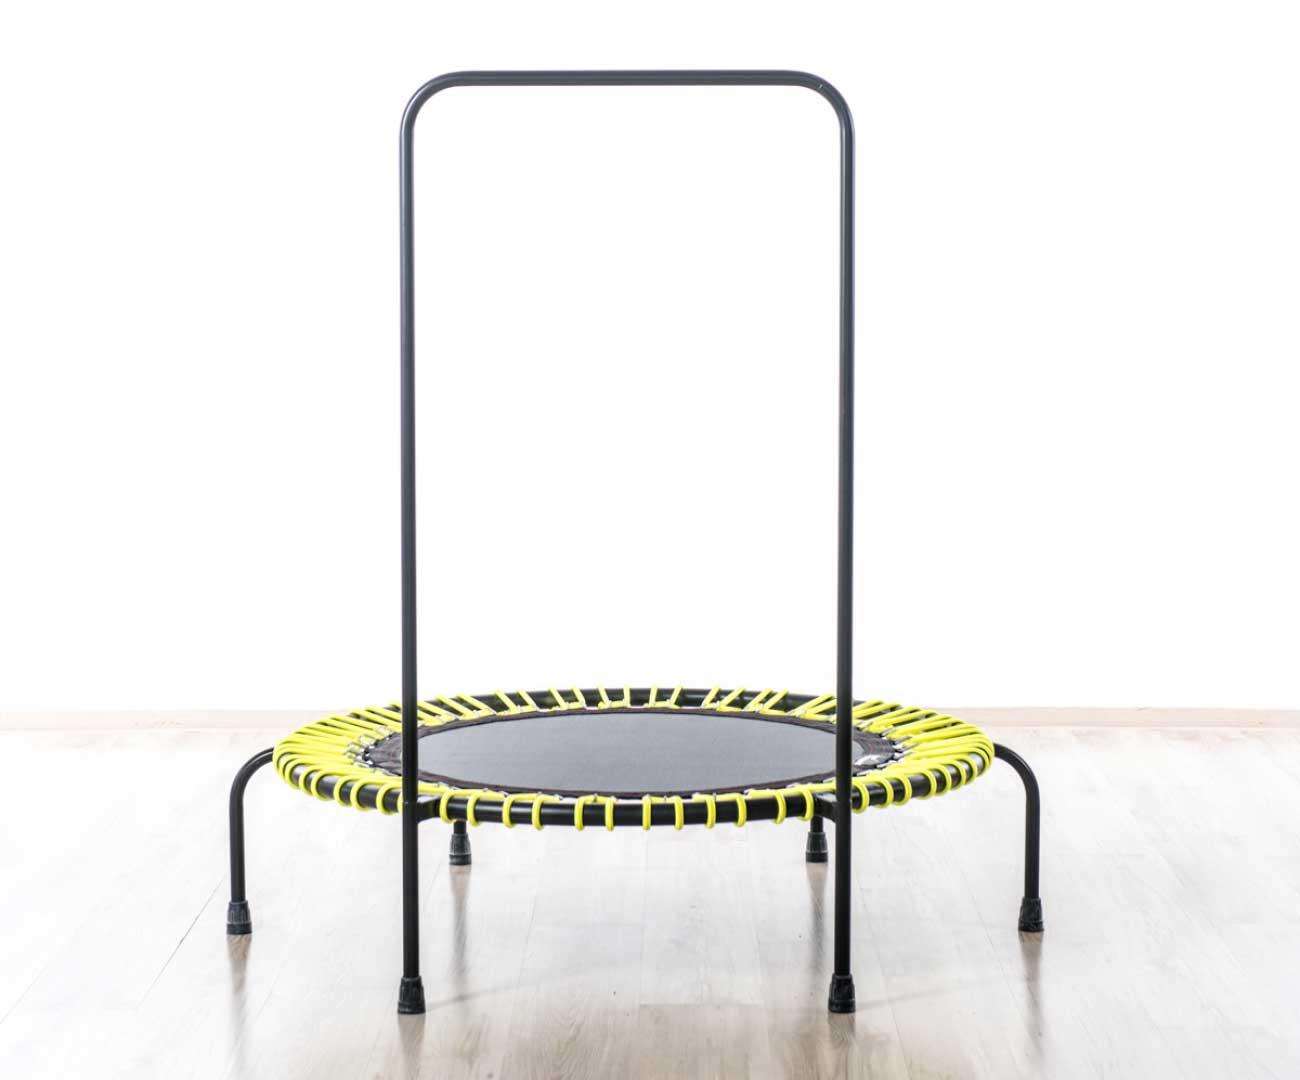 Akrobat Speed Bouncer